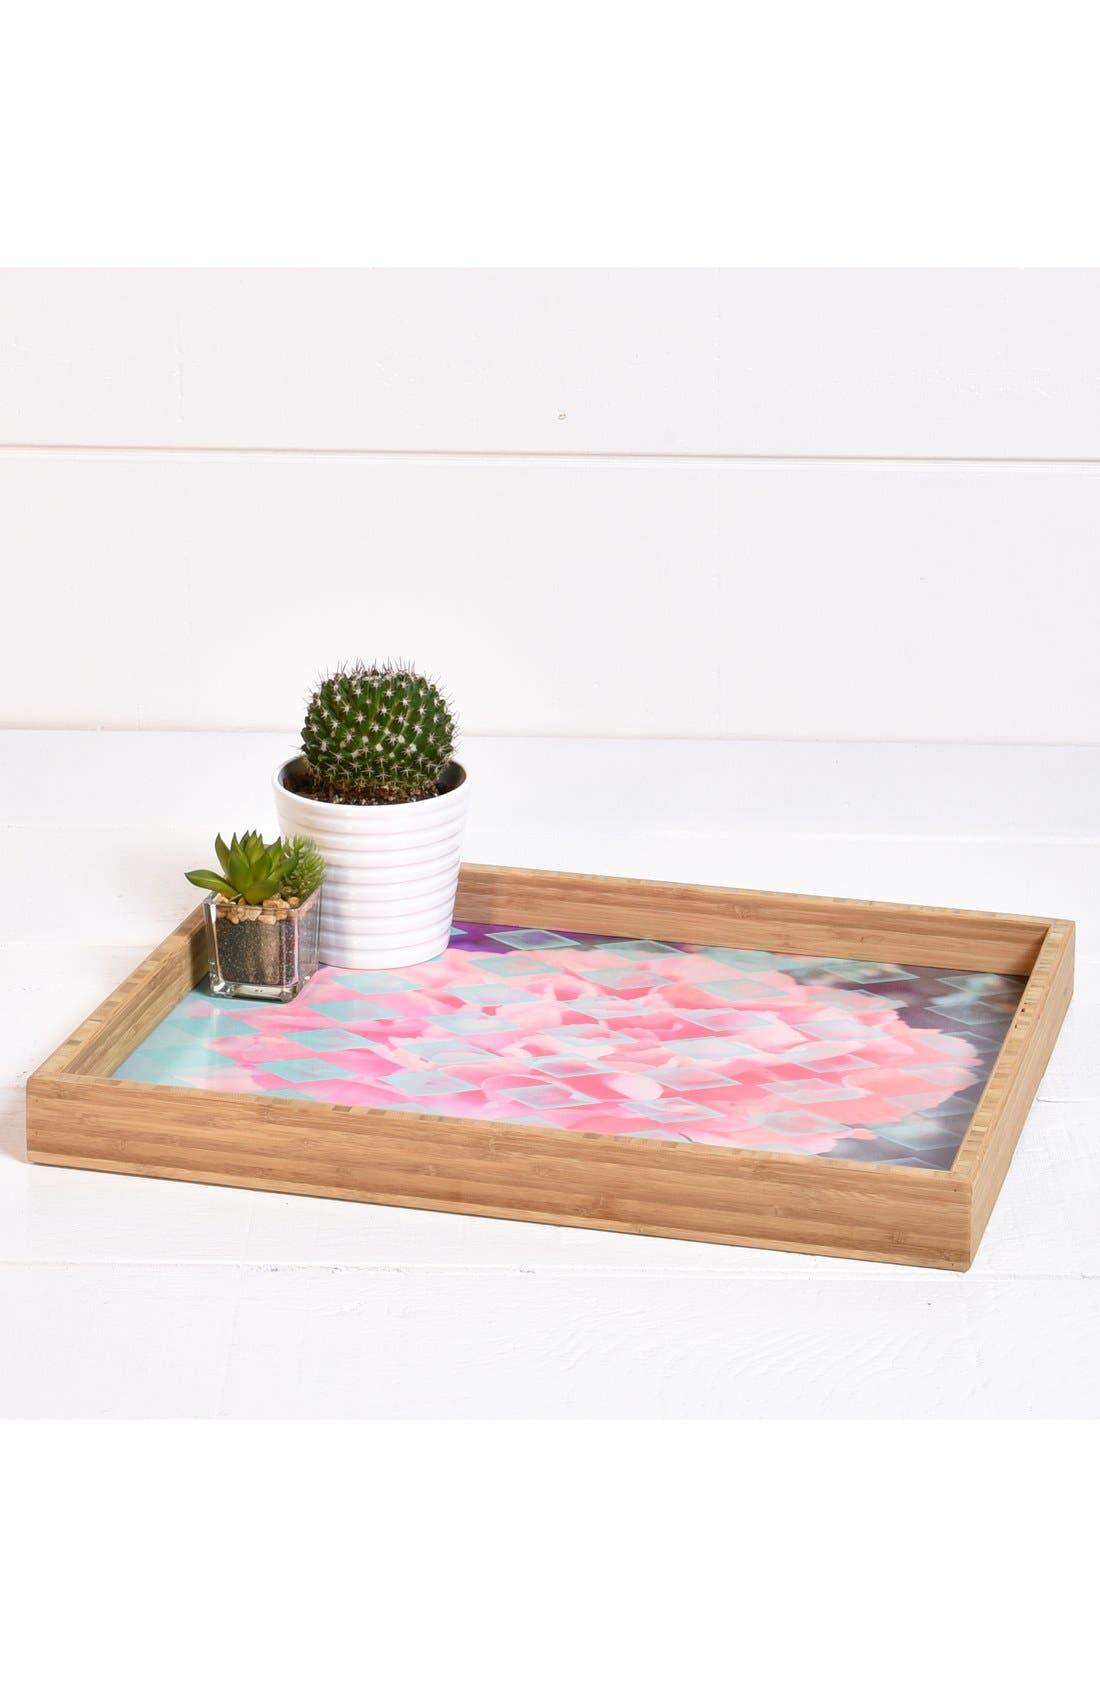 'Floral Diamonds' Decorative Serving Tray,                             Alternate thumbnail 3, color,